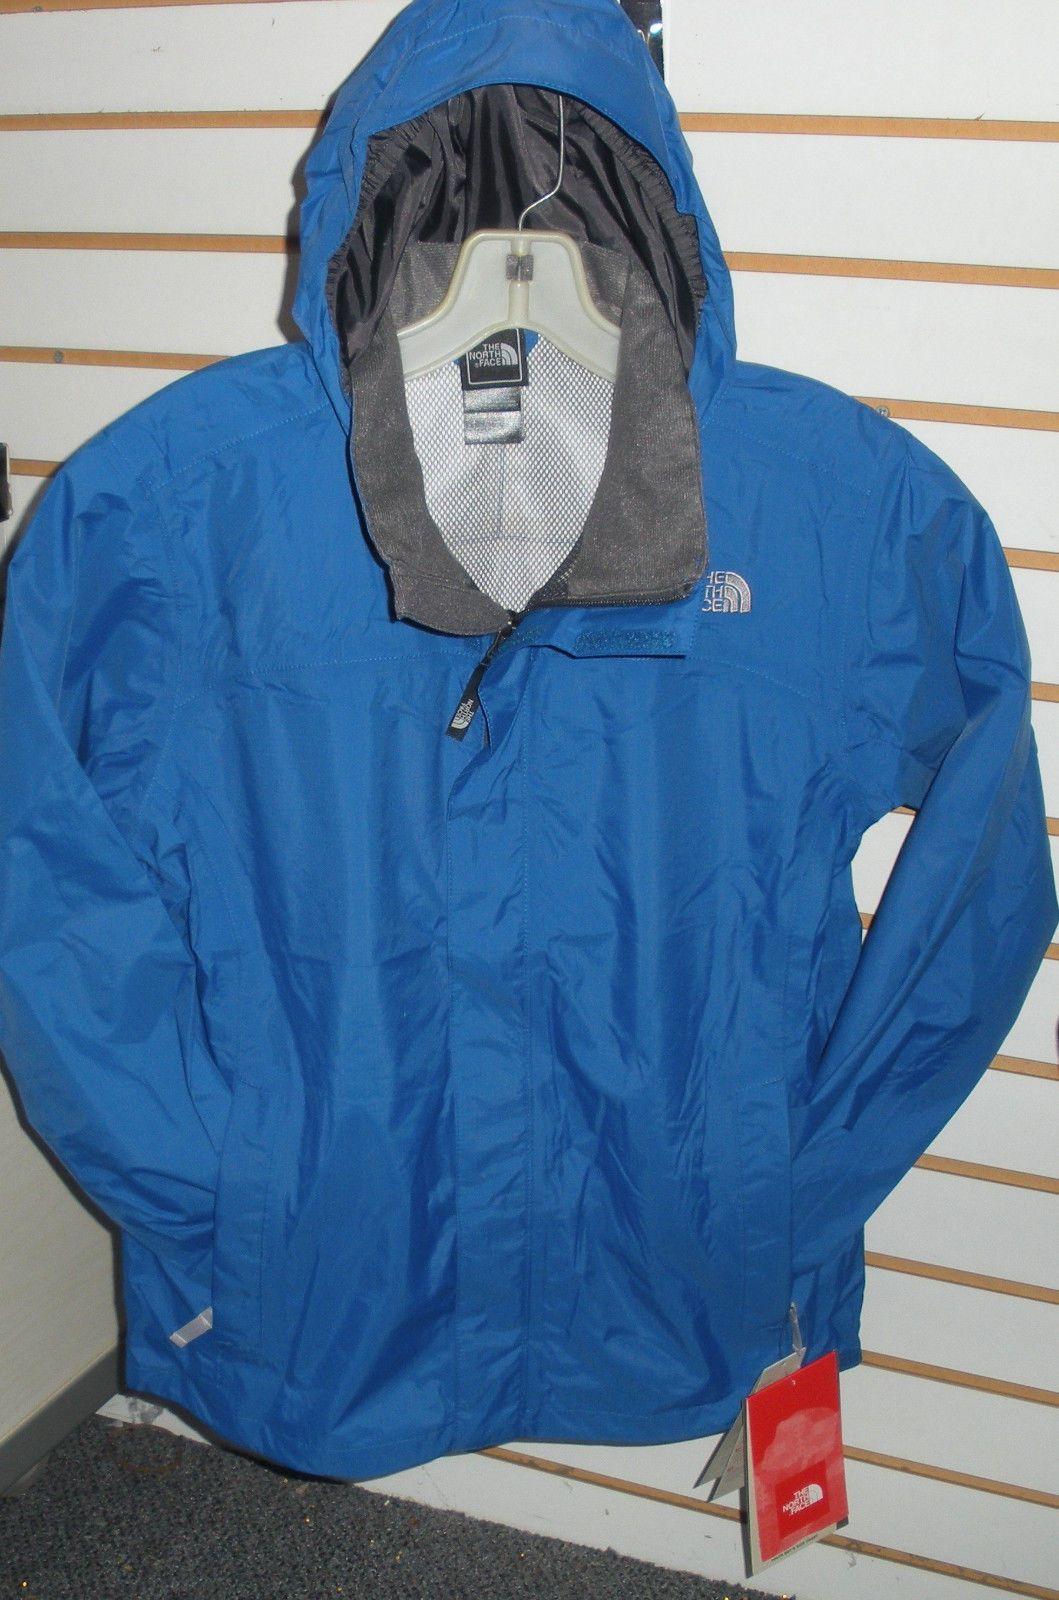 072c593f9ae6 Outerwear 51933  The North Face Boys Resolve Rain Jacket- Waterproof -Aqfy-  Nautical